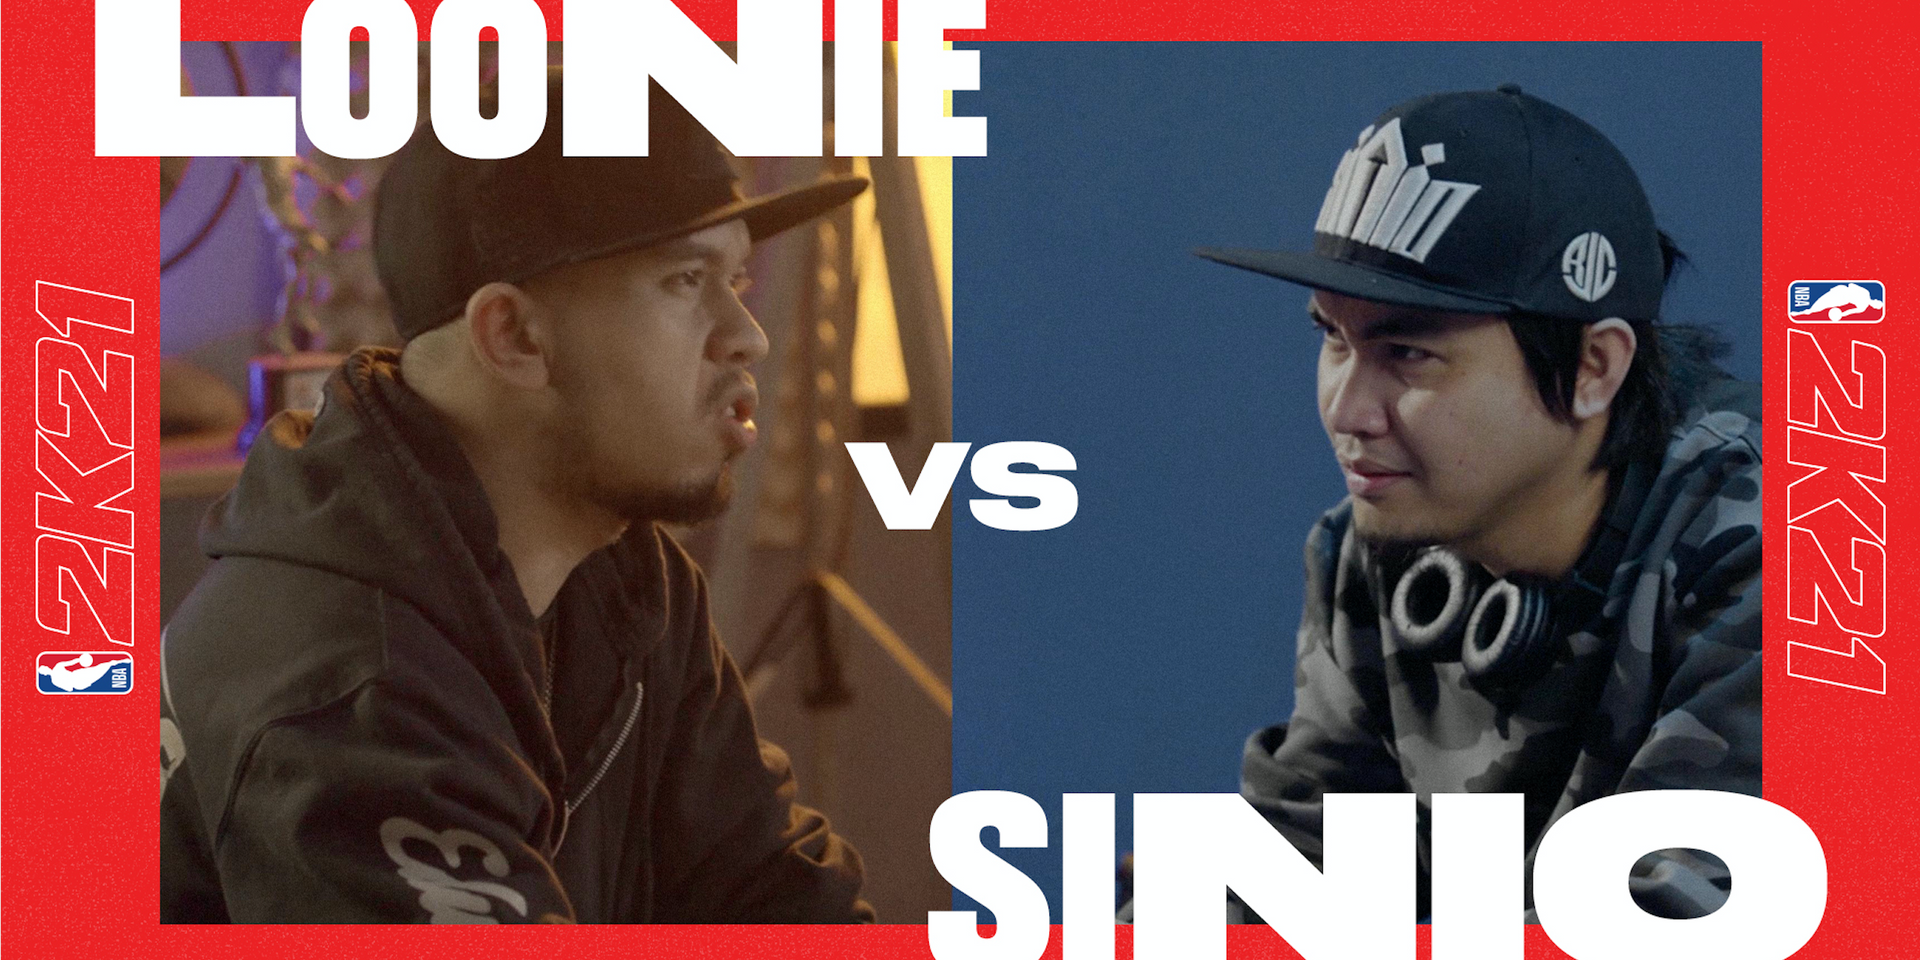 FlipTop legends Loonie and Sinio face off in rap battle on NBA 2K21 - watch